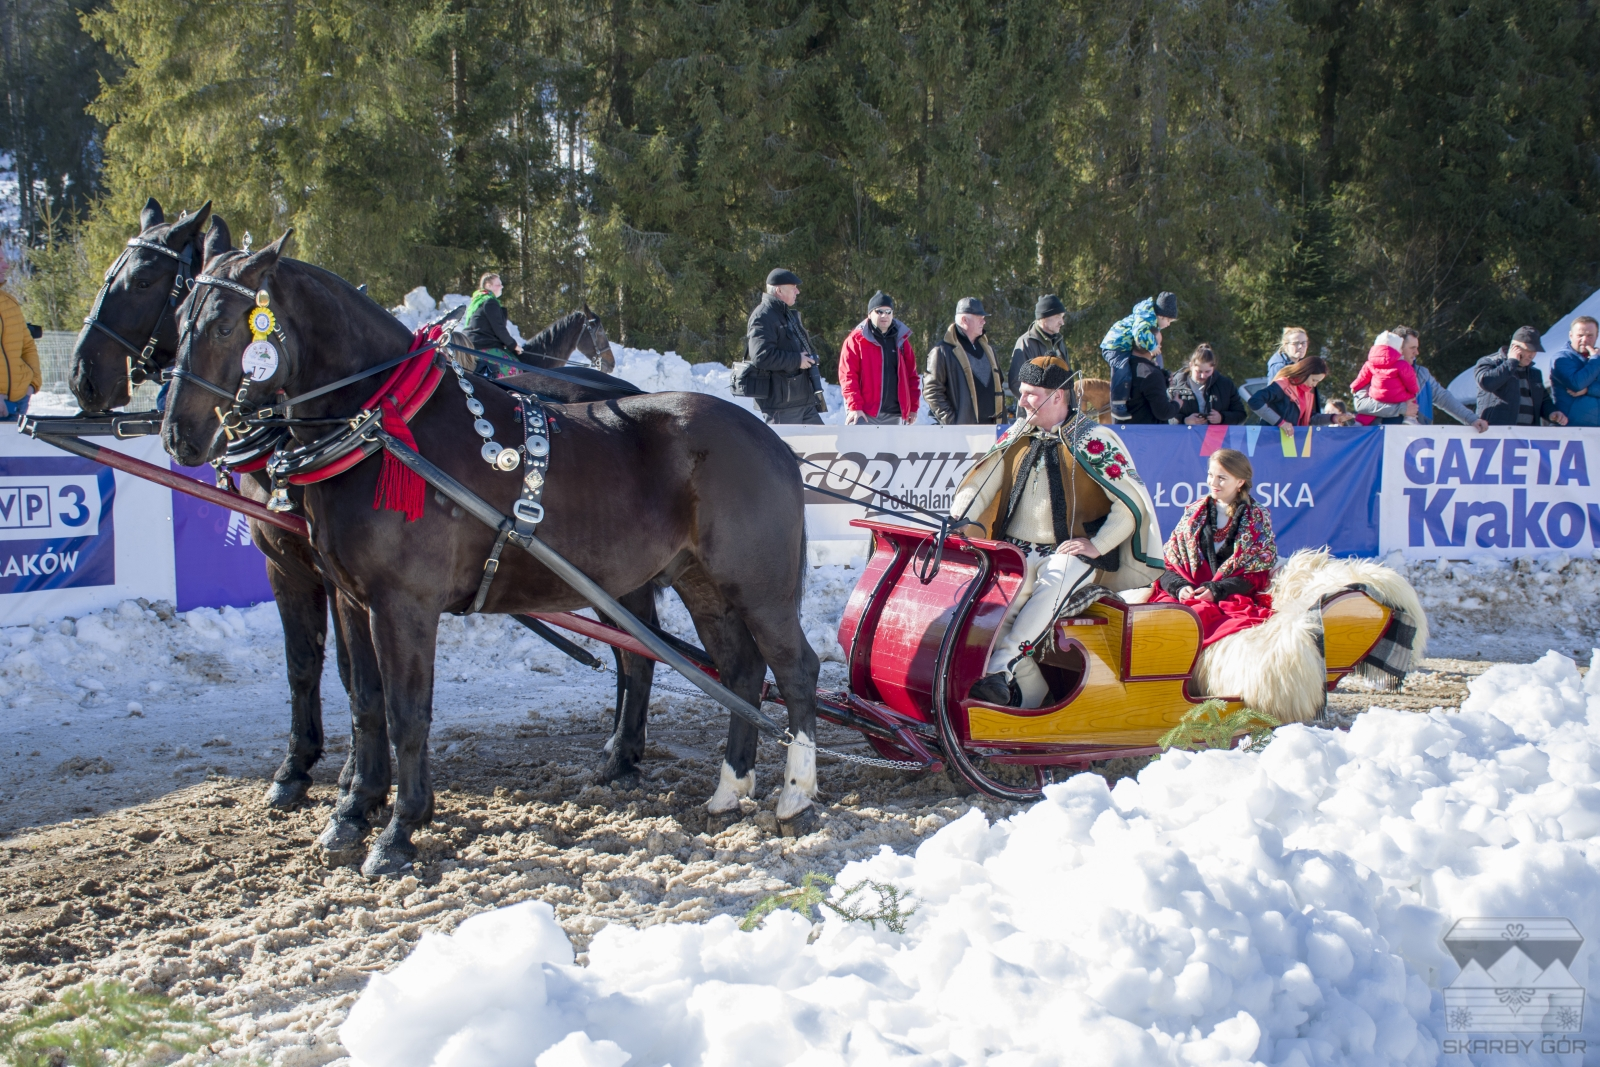 47. Góralski Karnawał - parada gazdowska, parada kumoterek 2019